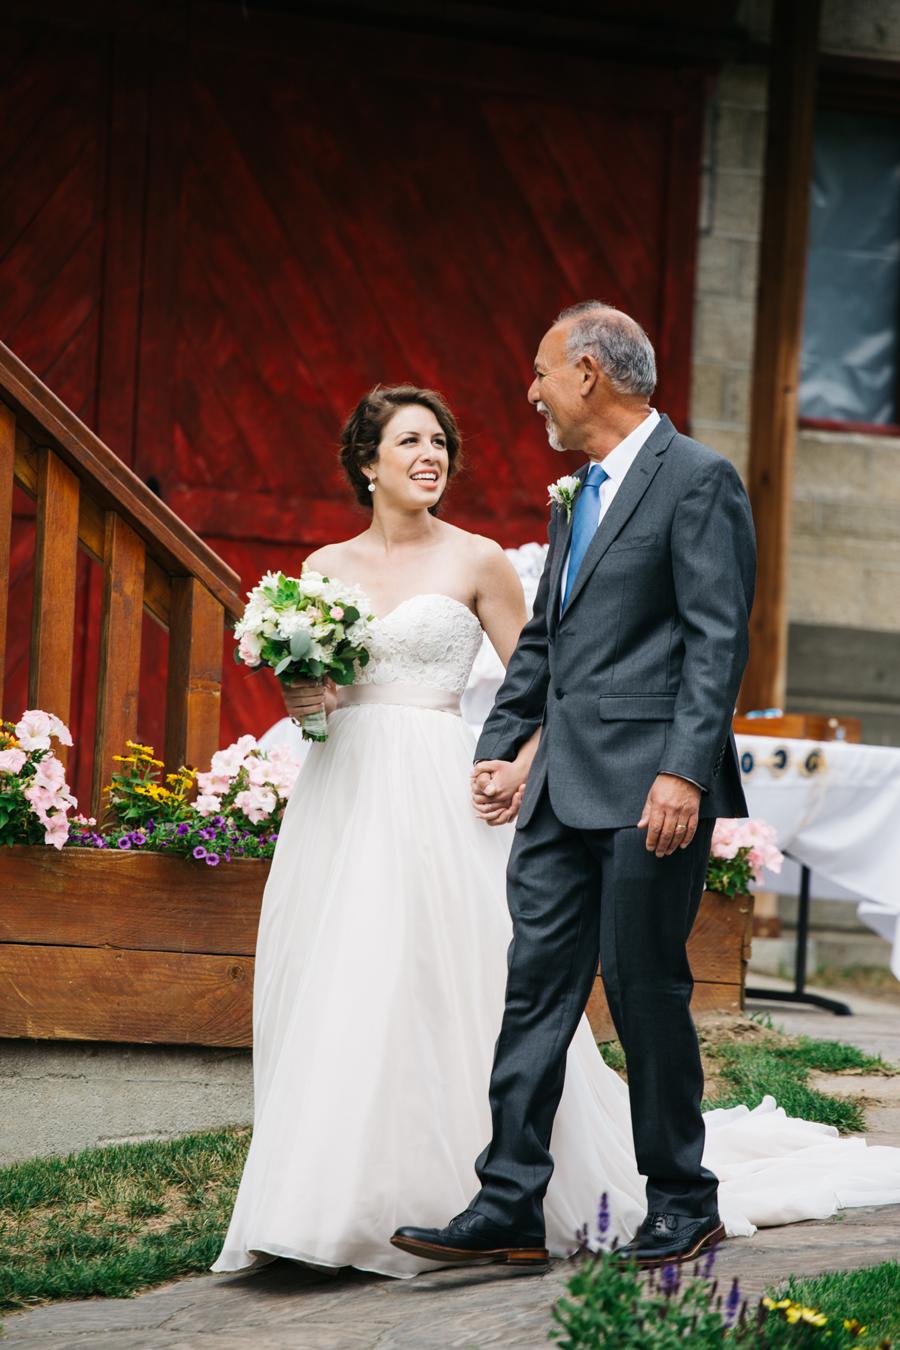 049-pine-river-ranch-leavenworth-washington-destination-wedding-katheryn-moran-photography.jpg